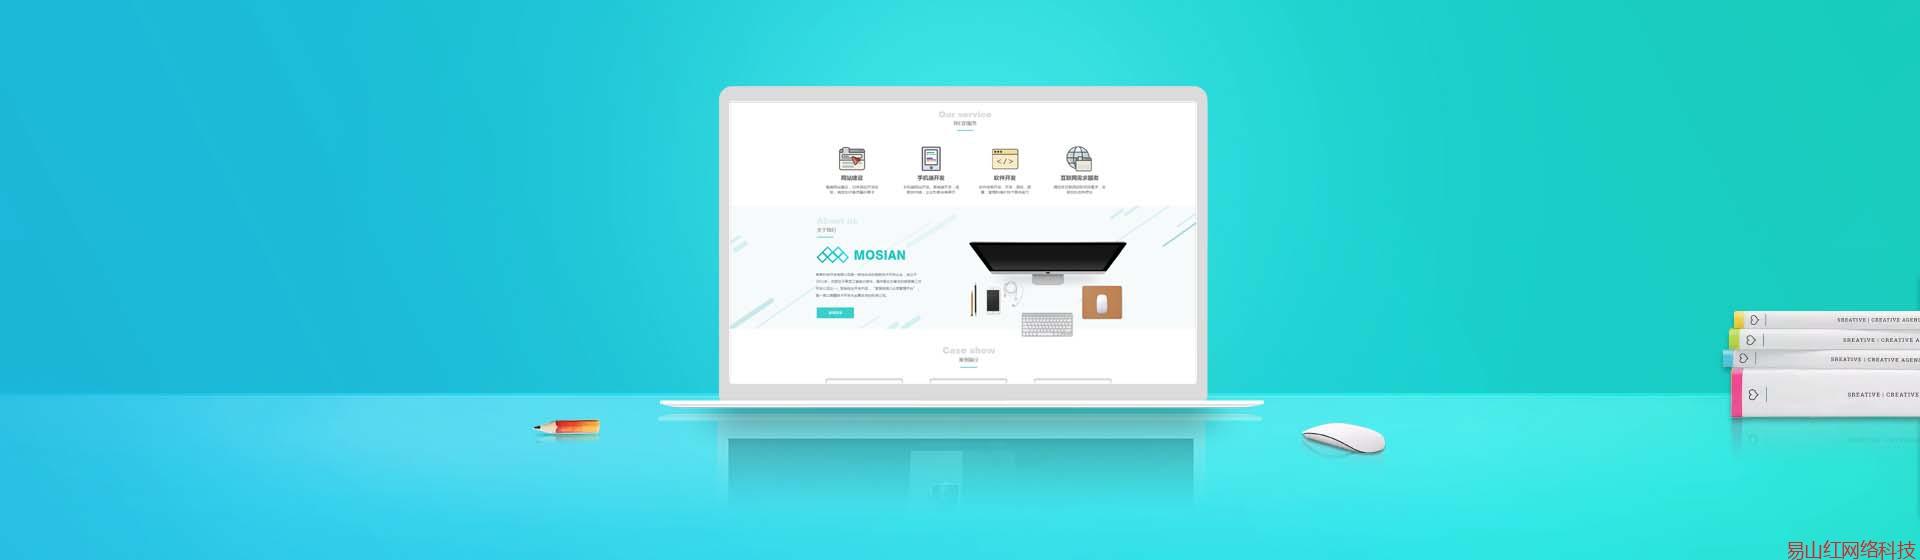 PC+手机+微信+APP+微信小程序五站合一,多端适配,让更多人看到你的网站!